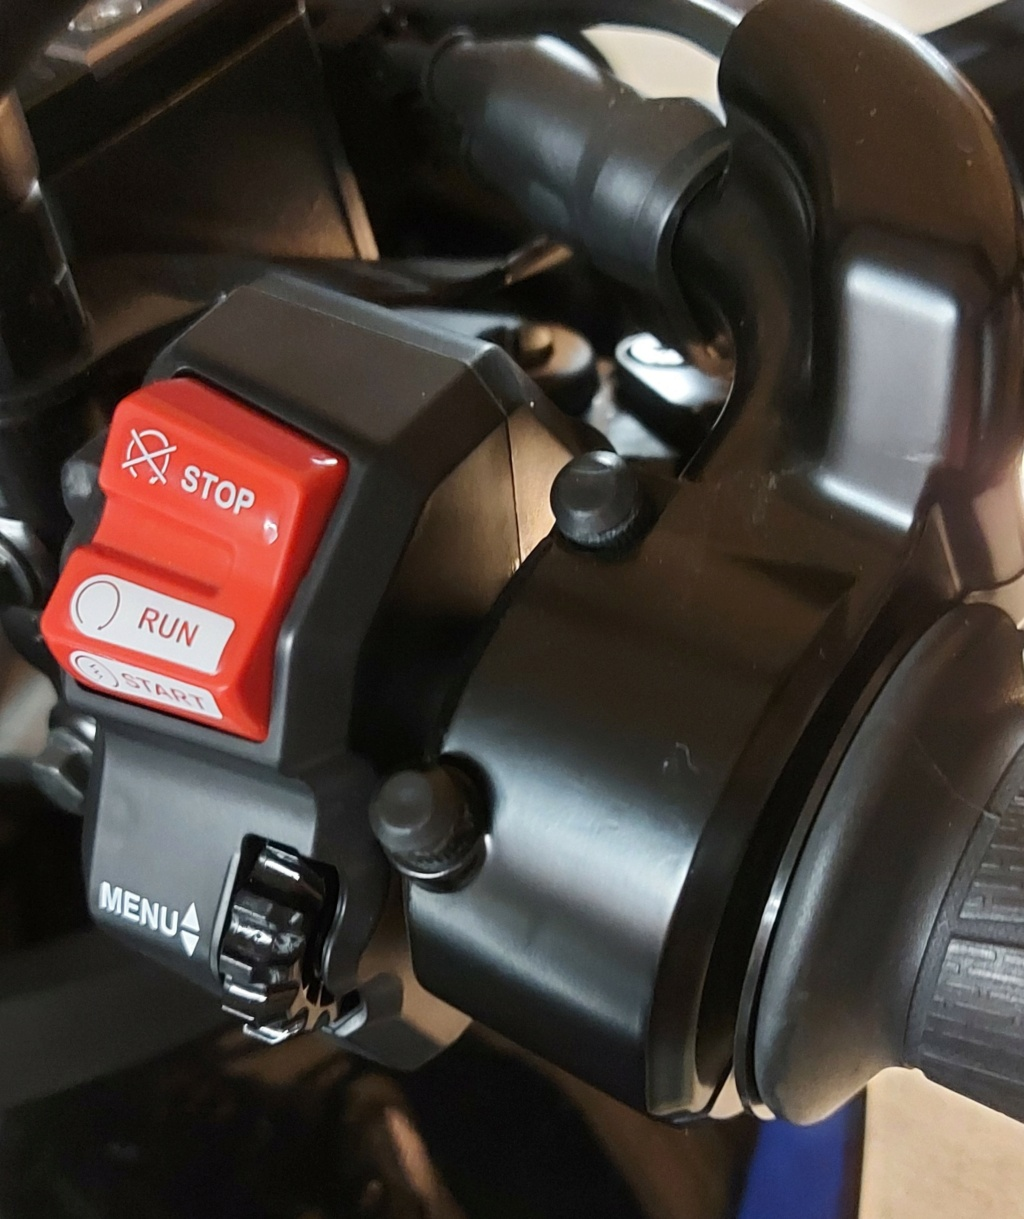 capuchon protecteur de vis BTR Aliexpress 20210224